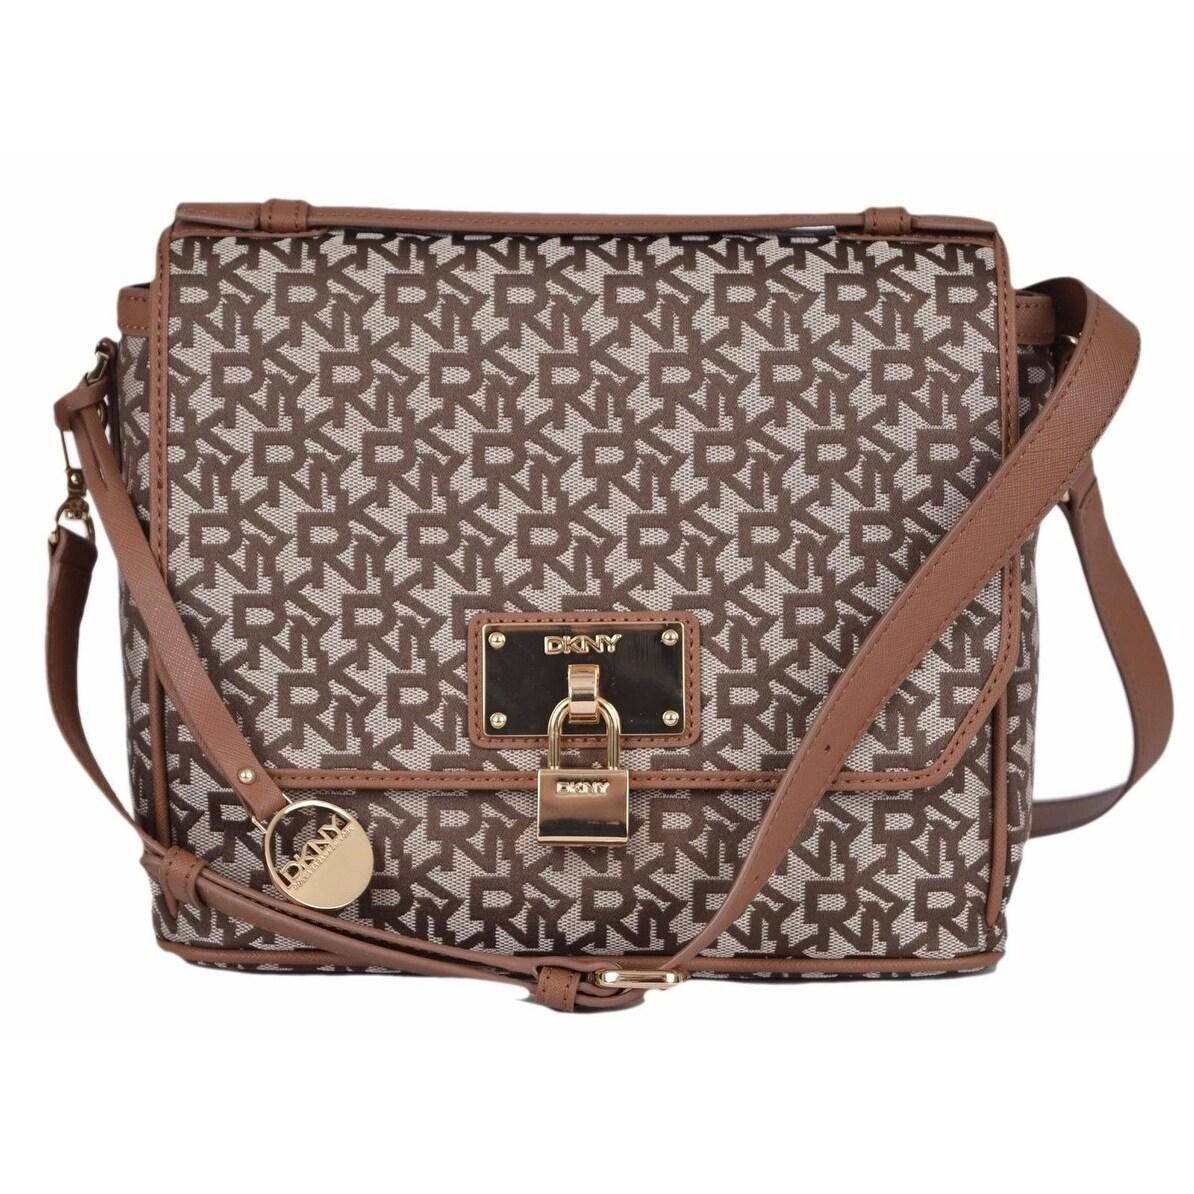 2ac25bacda9f Shop DKNY Donna Karan Chino Logo Heritage Lock Crossbody Top Handle Purse  Handbag - On Sale - Free Shipping Today - Overstock - 12171520